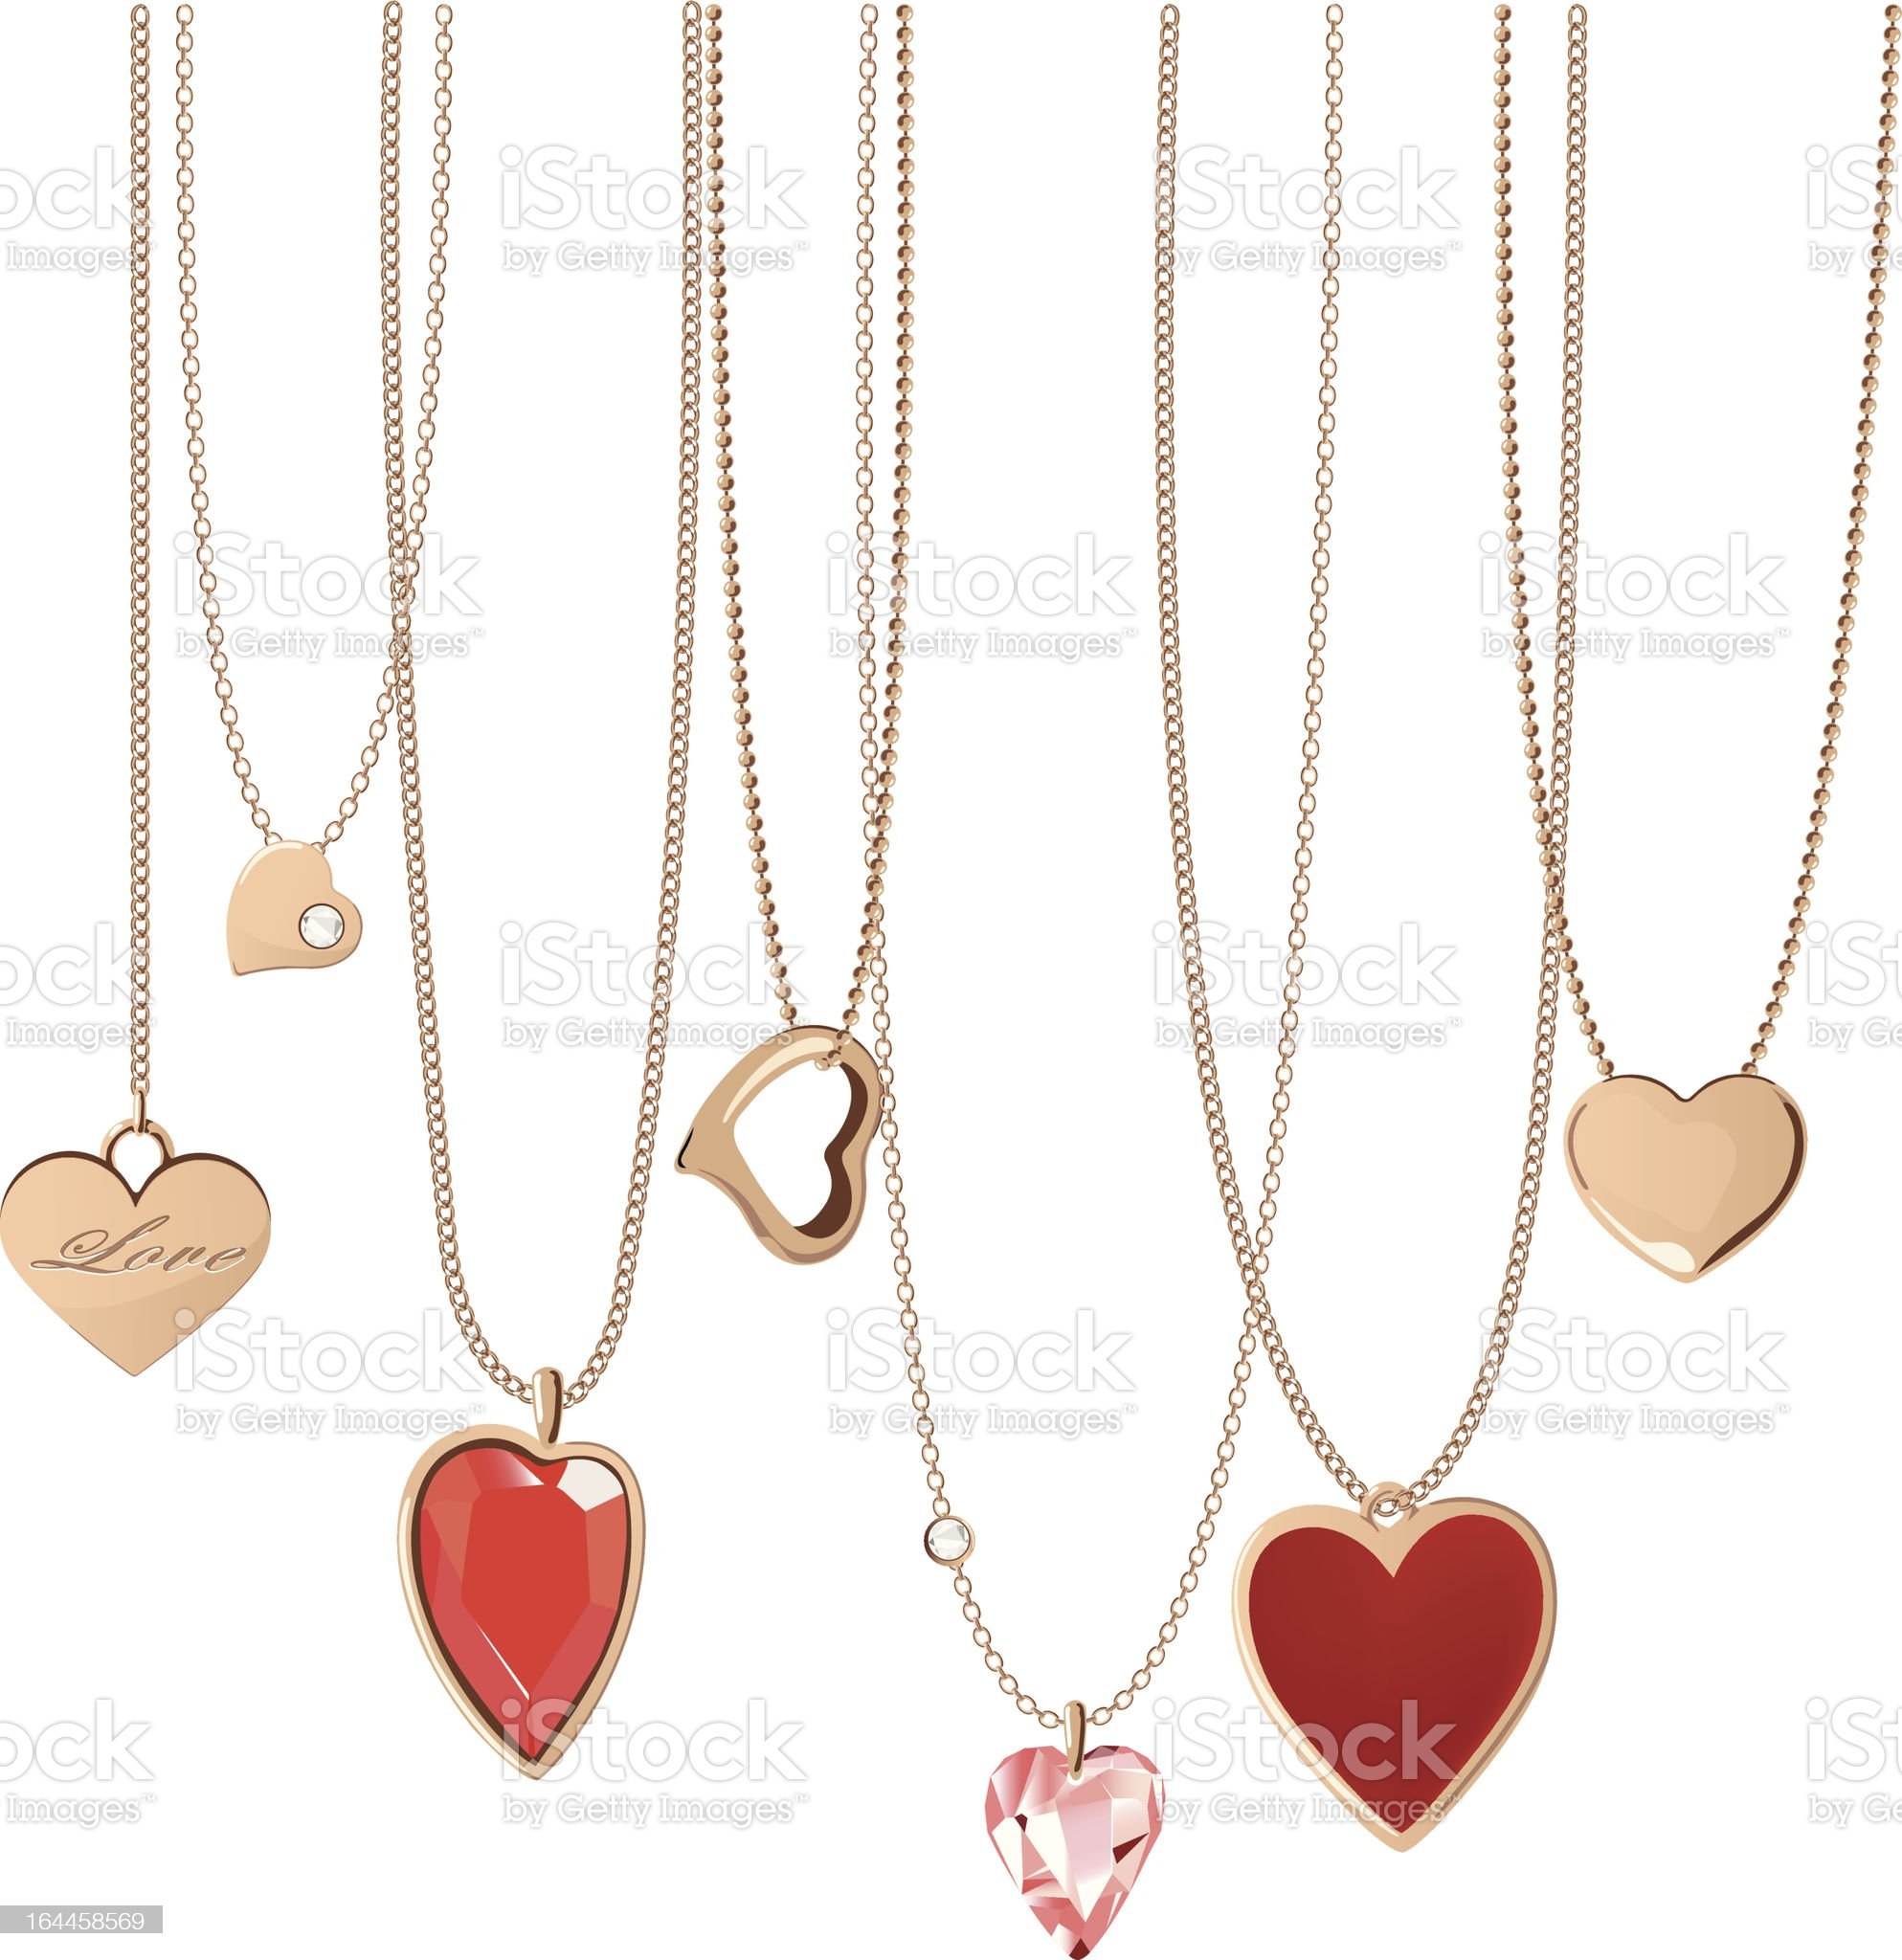 Heart Jewellery royalty-free stock vector art